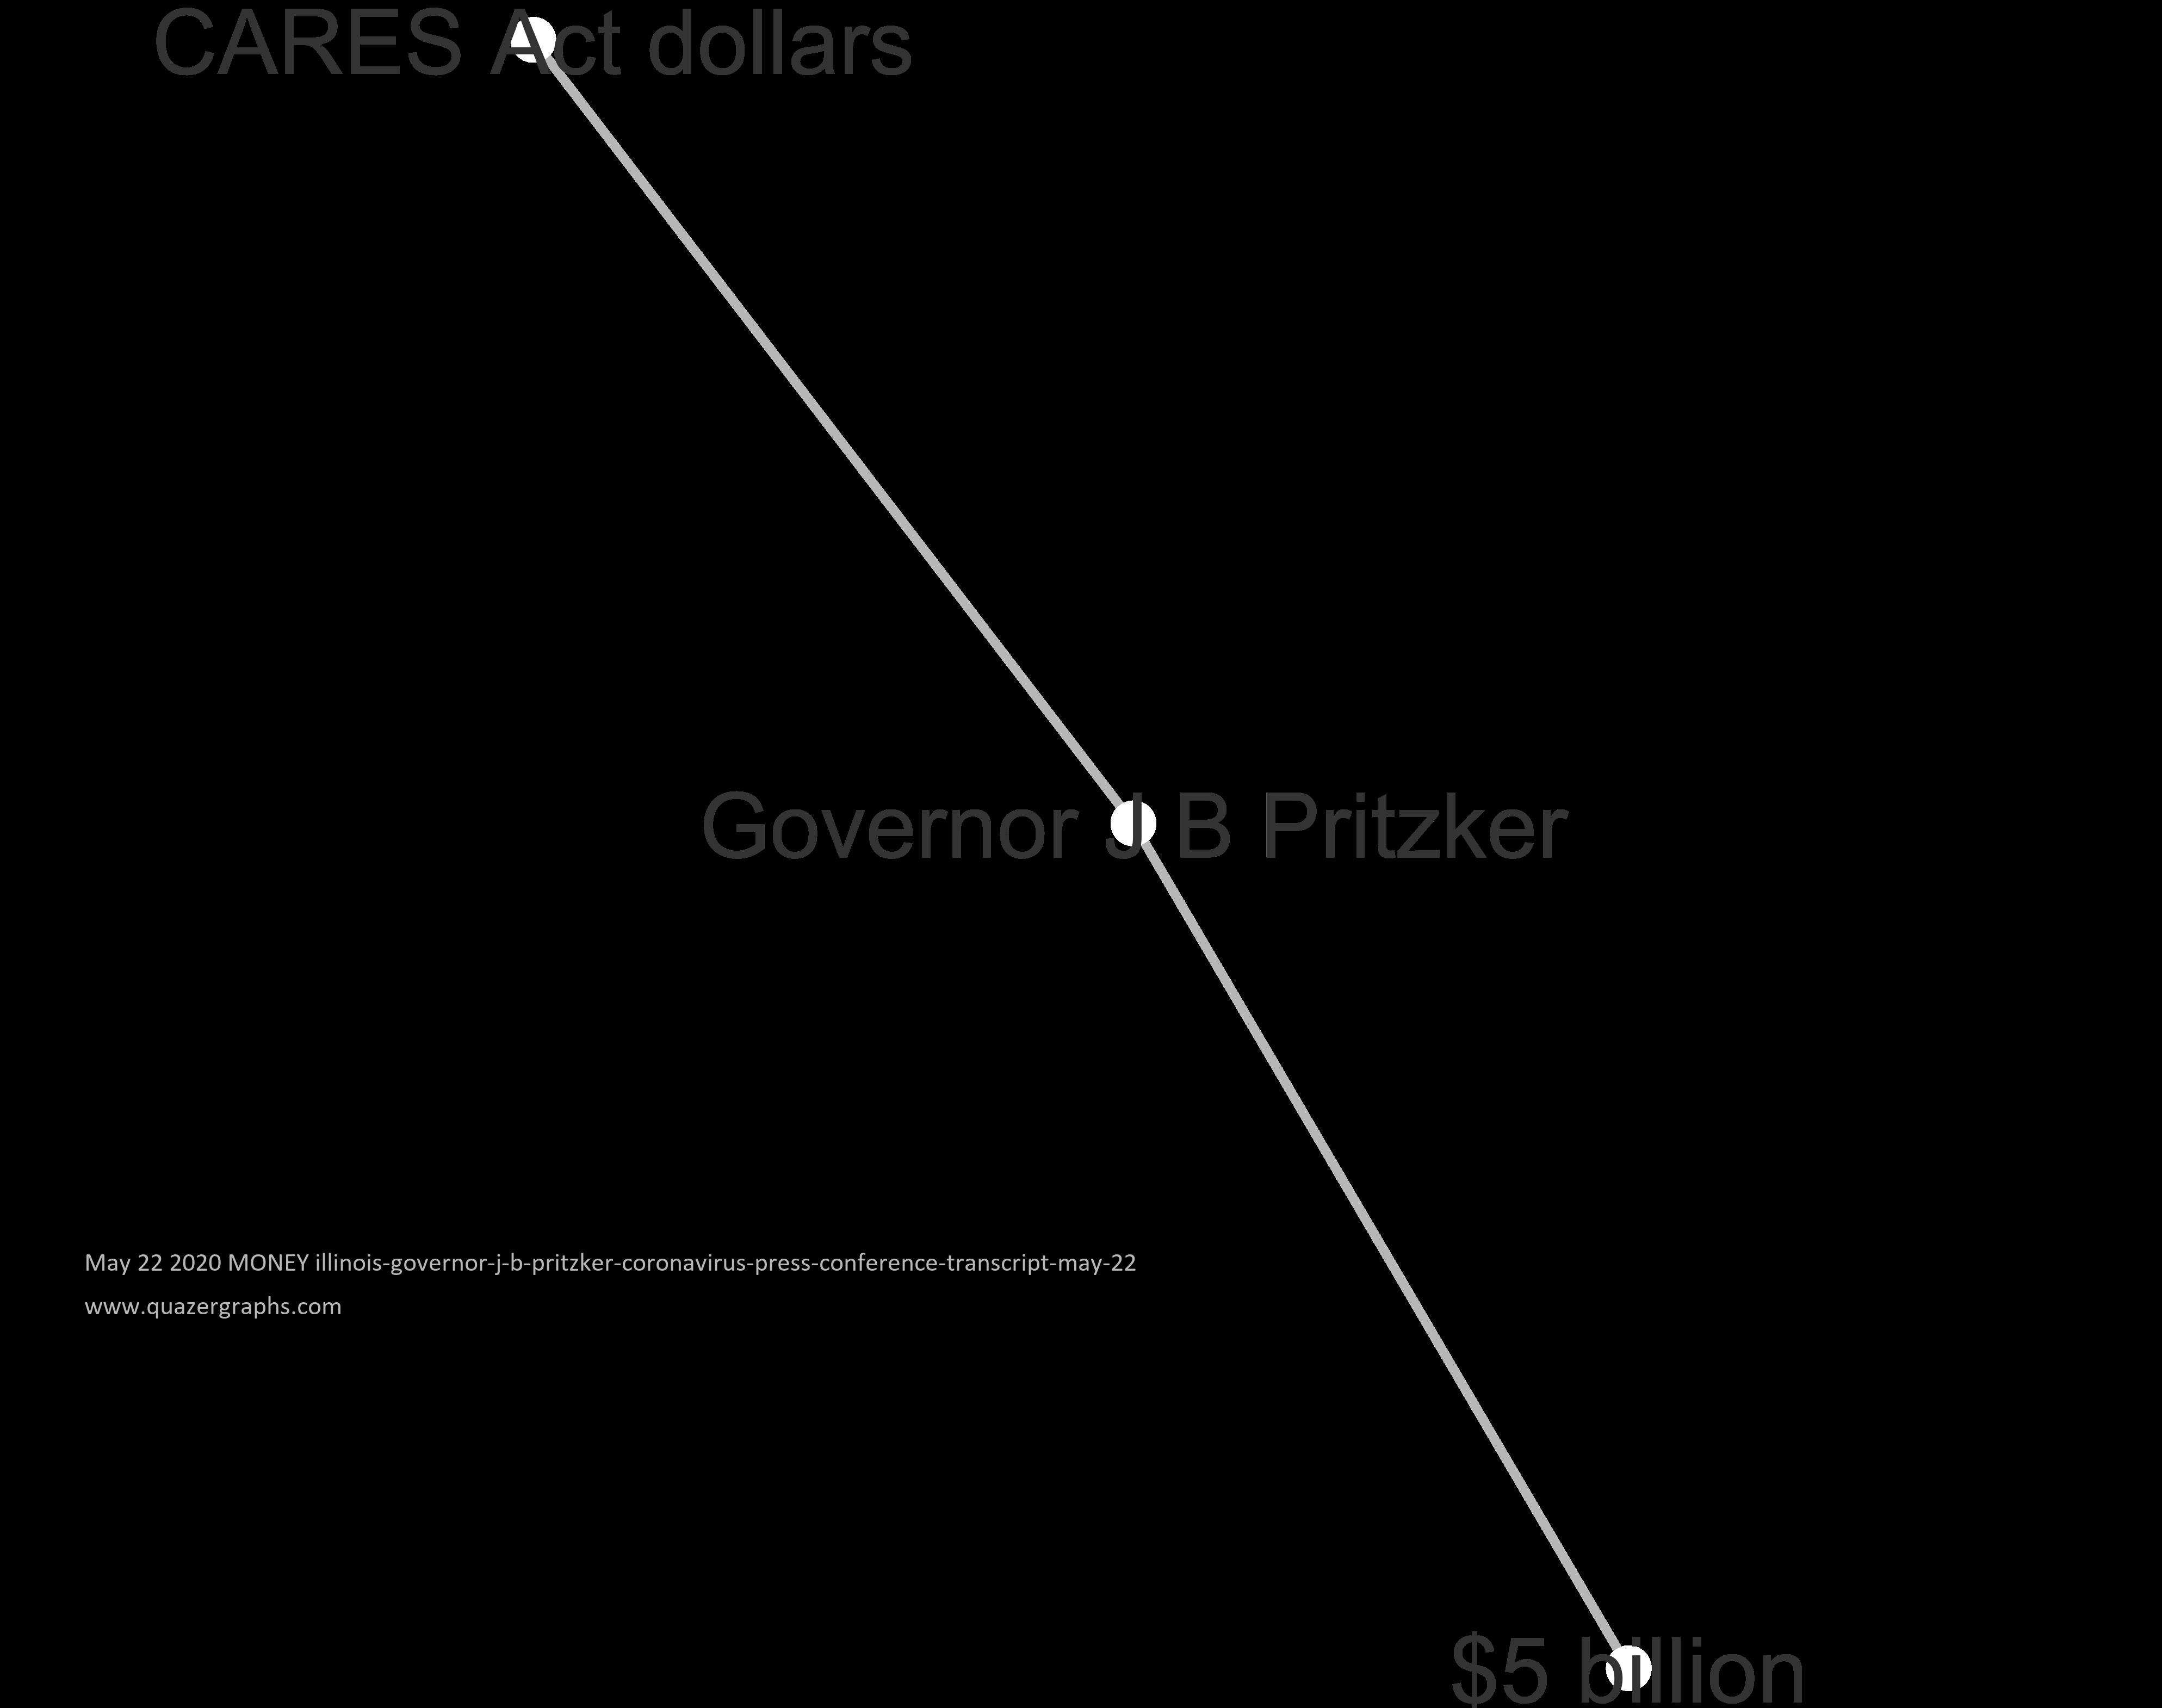 May 22 2020 MONEY illinois-governor-j-b-pritzker-coronavirus-press-conference-transcript-may-22